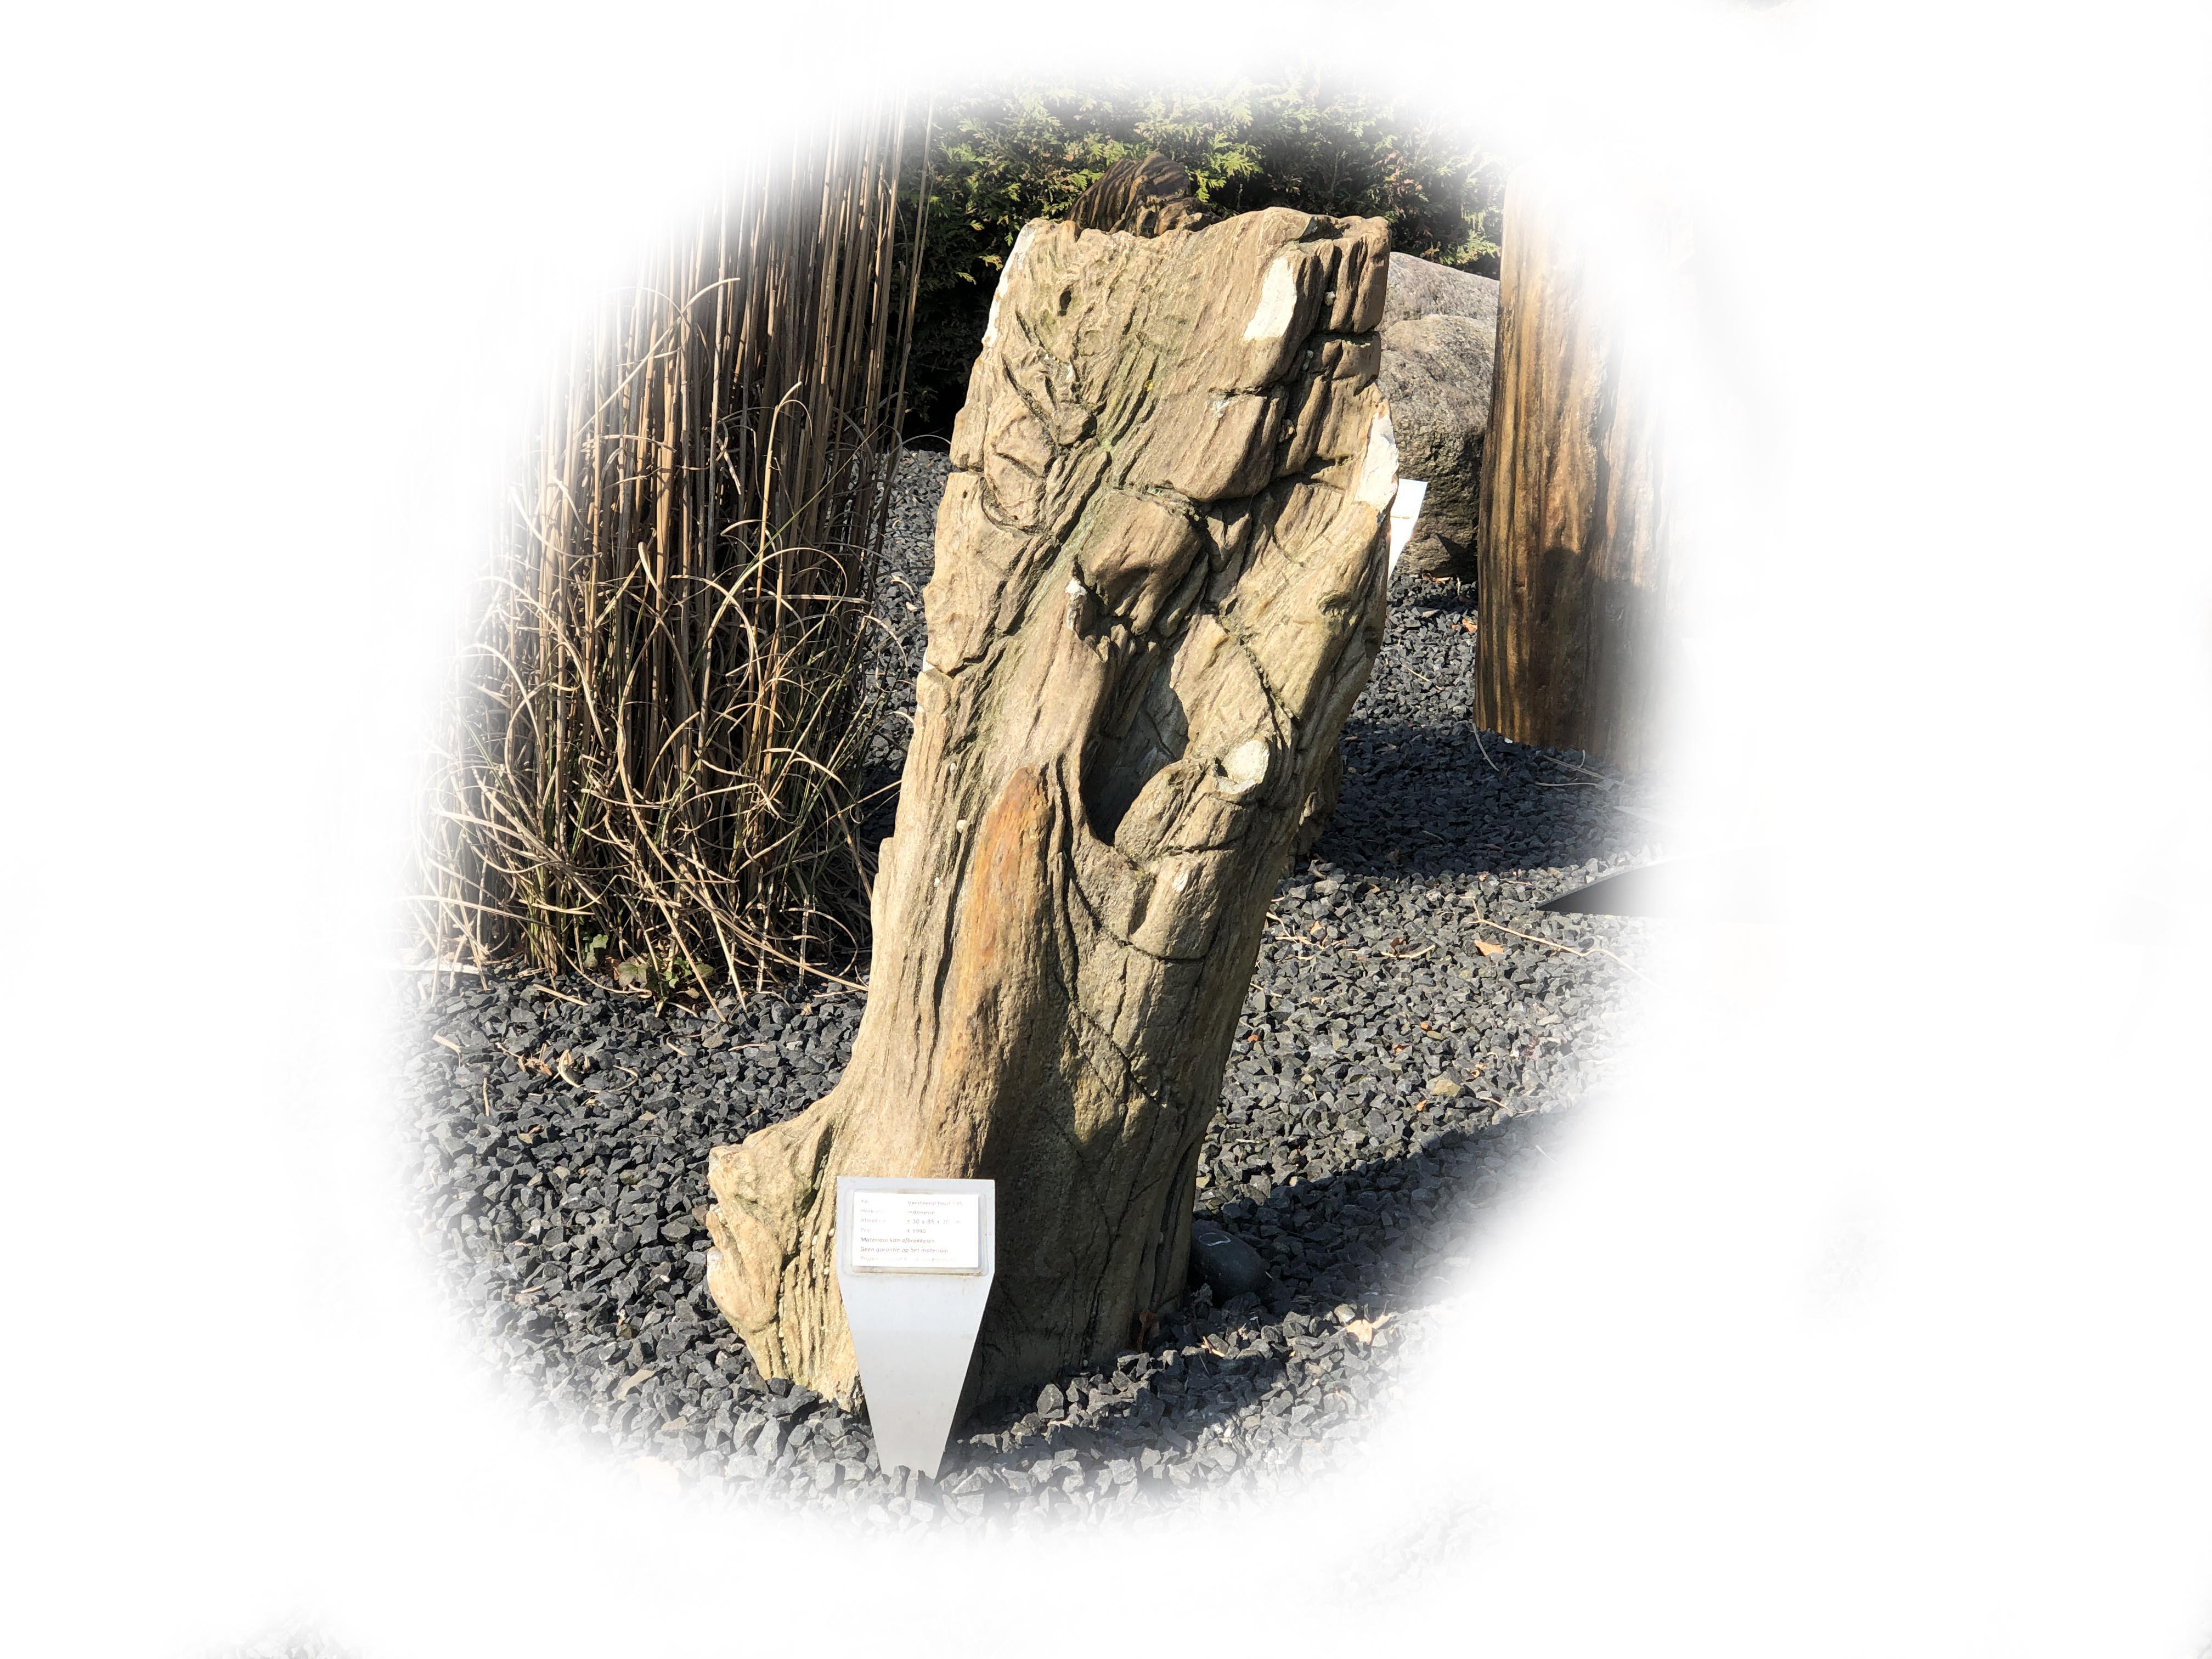 Versteend hout K-135